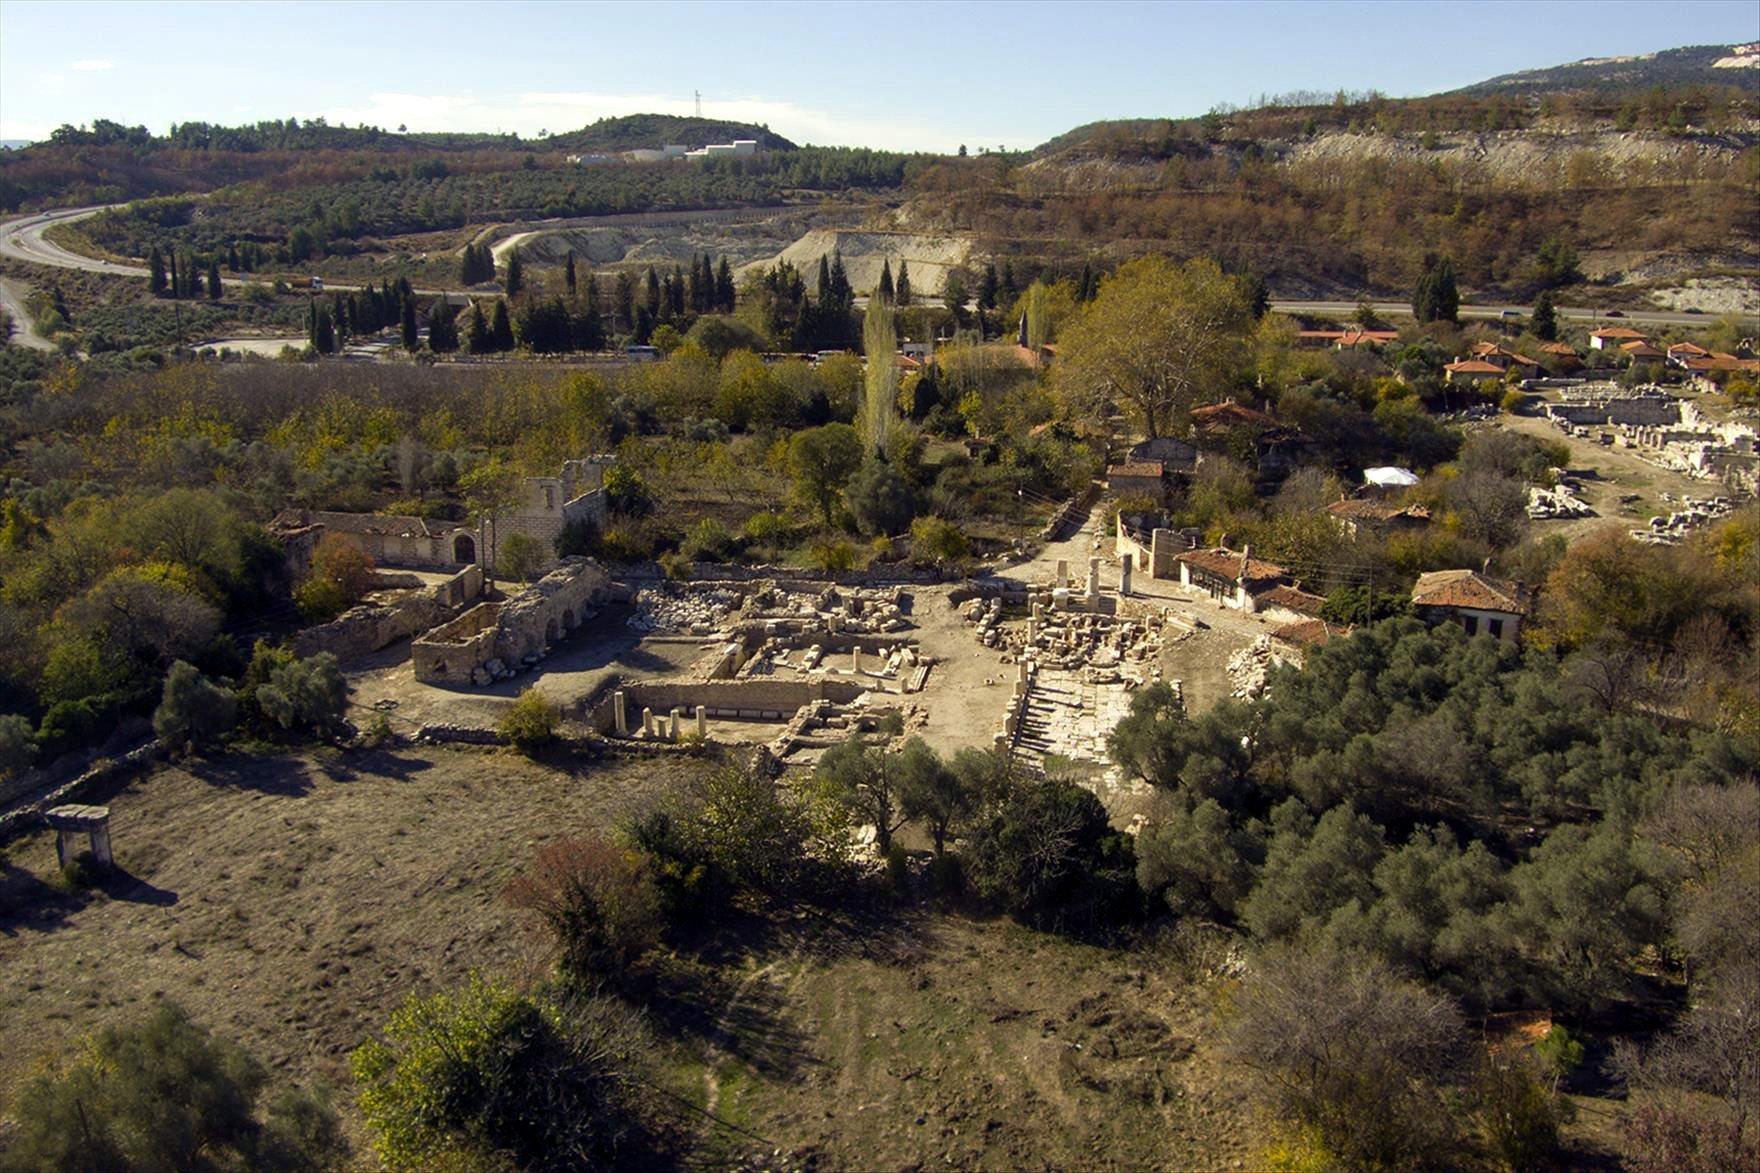 A general view from the ancient city of Stratonikeia, Muğla, southwestern Turkey, Nov. 22, 2018. (PHOTO BY KENAN GÜRBÜZ)